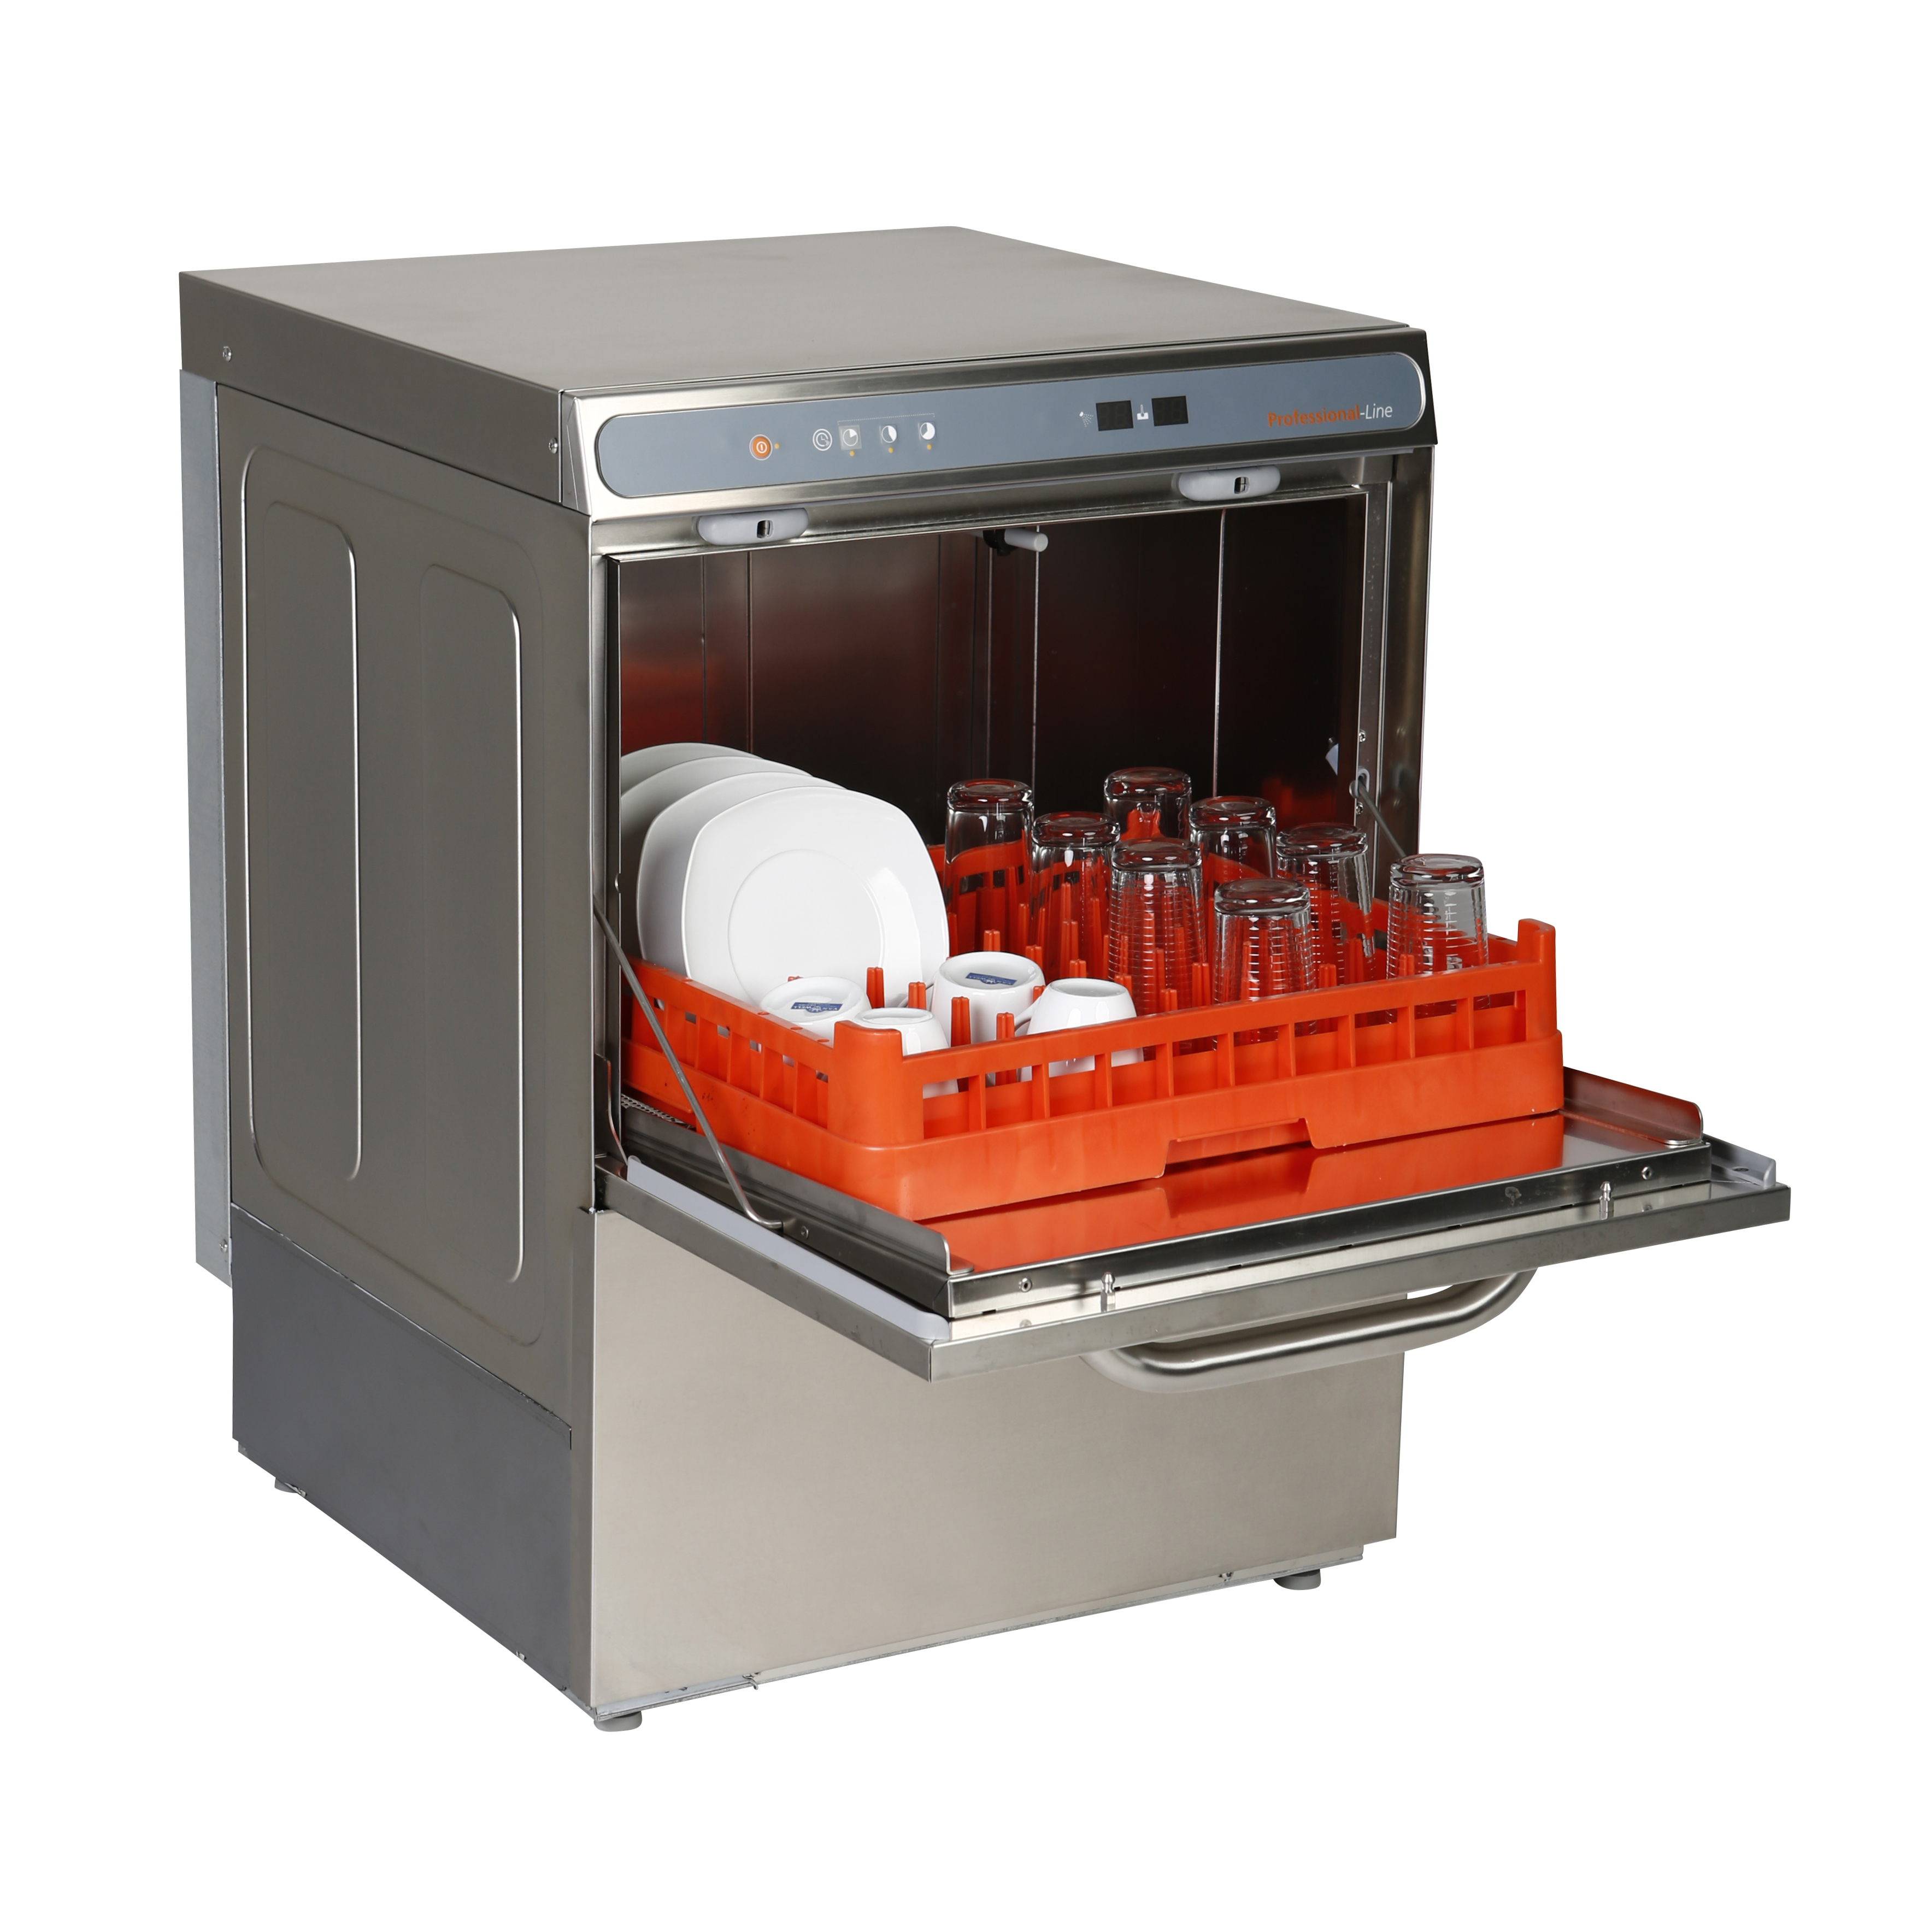 Geschirrspülmaschine PROFI 50 SL Digital line Shop GASTRO HELD